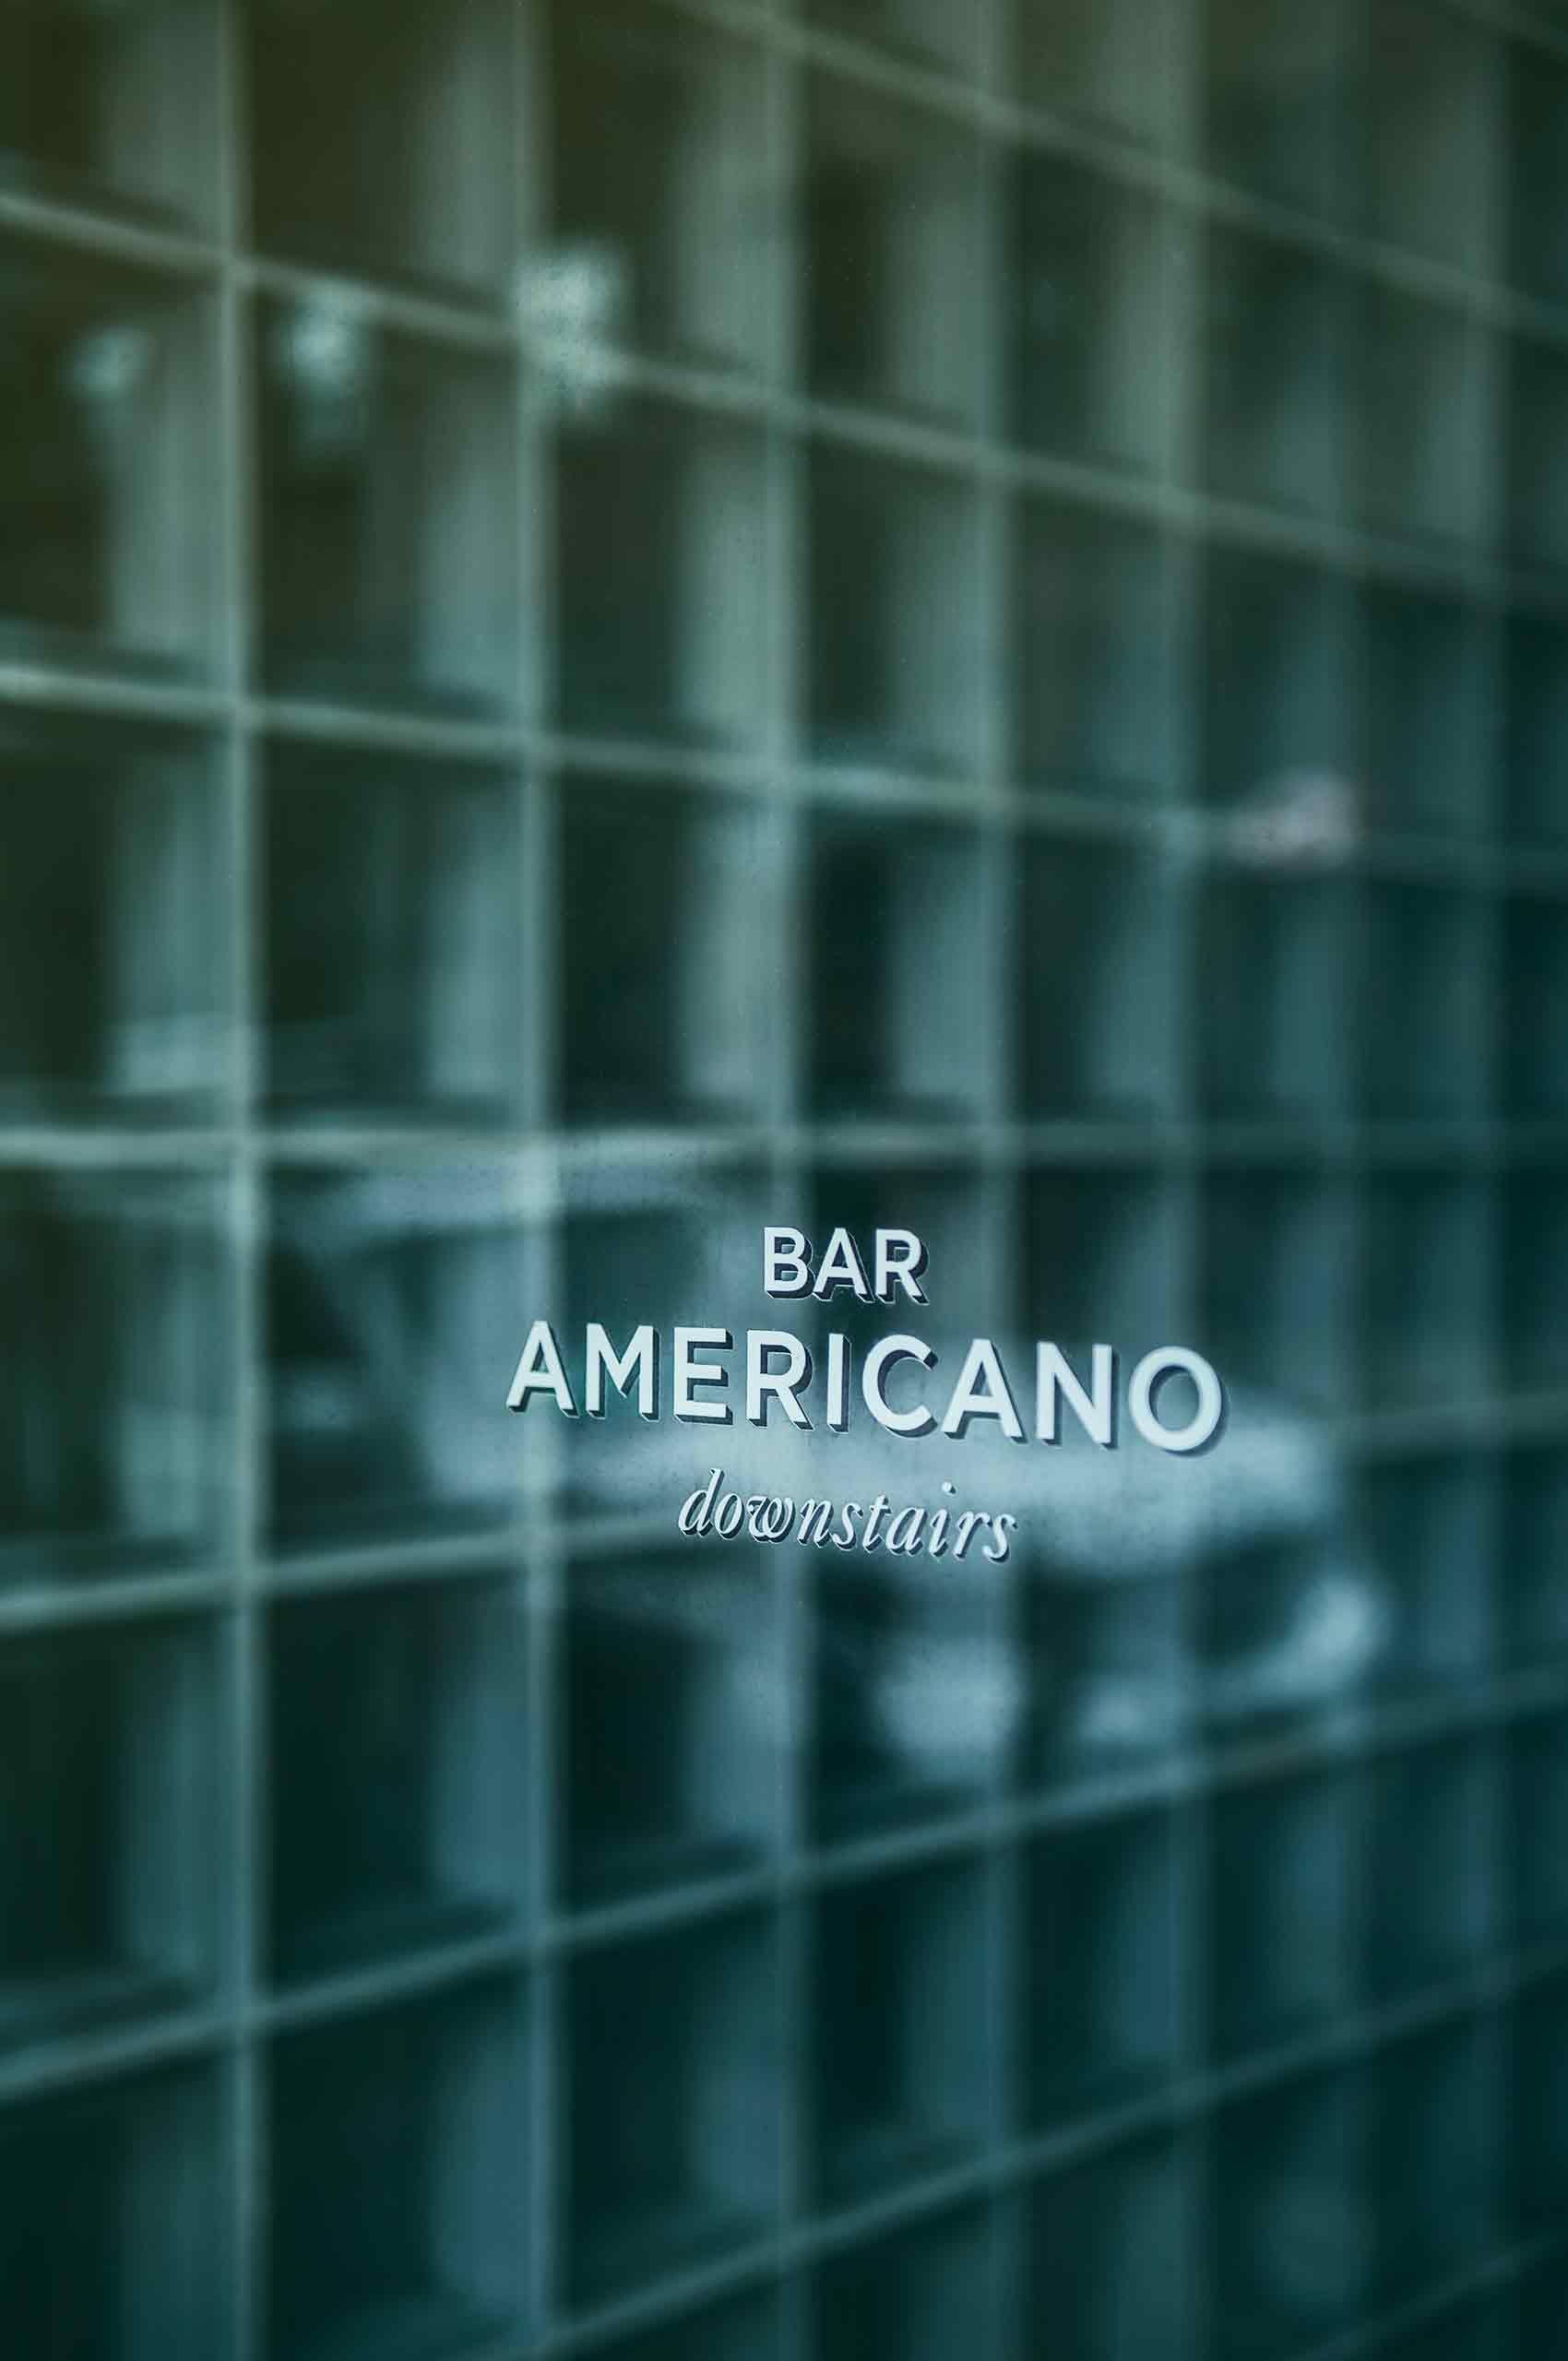 BarAmericano-by-HenrikOlundPhotography.jpg